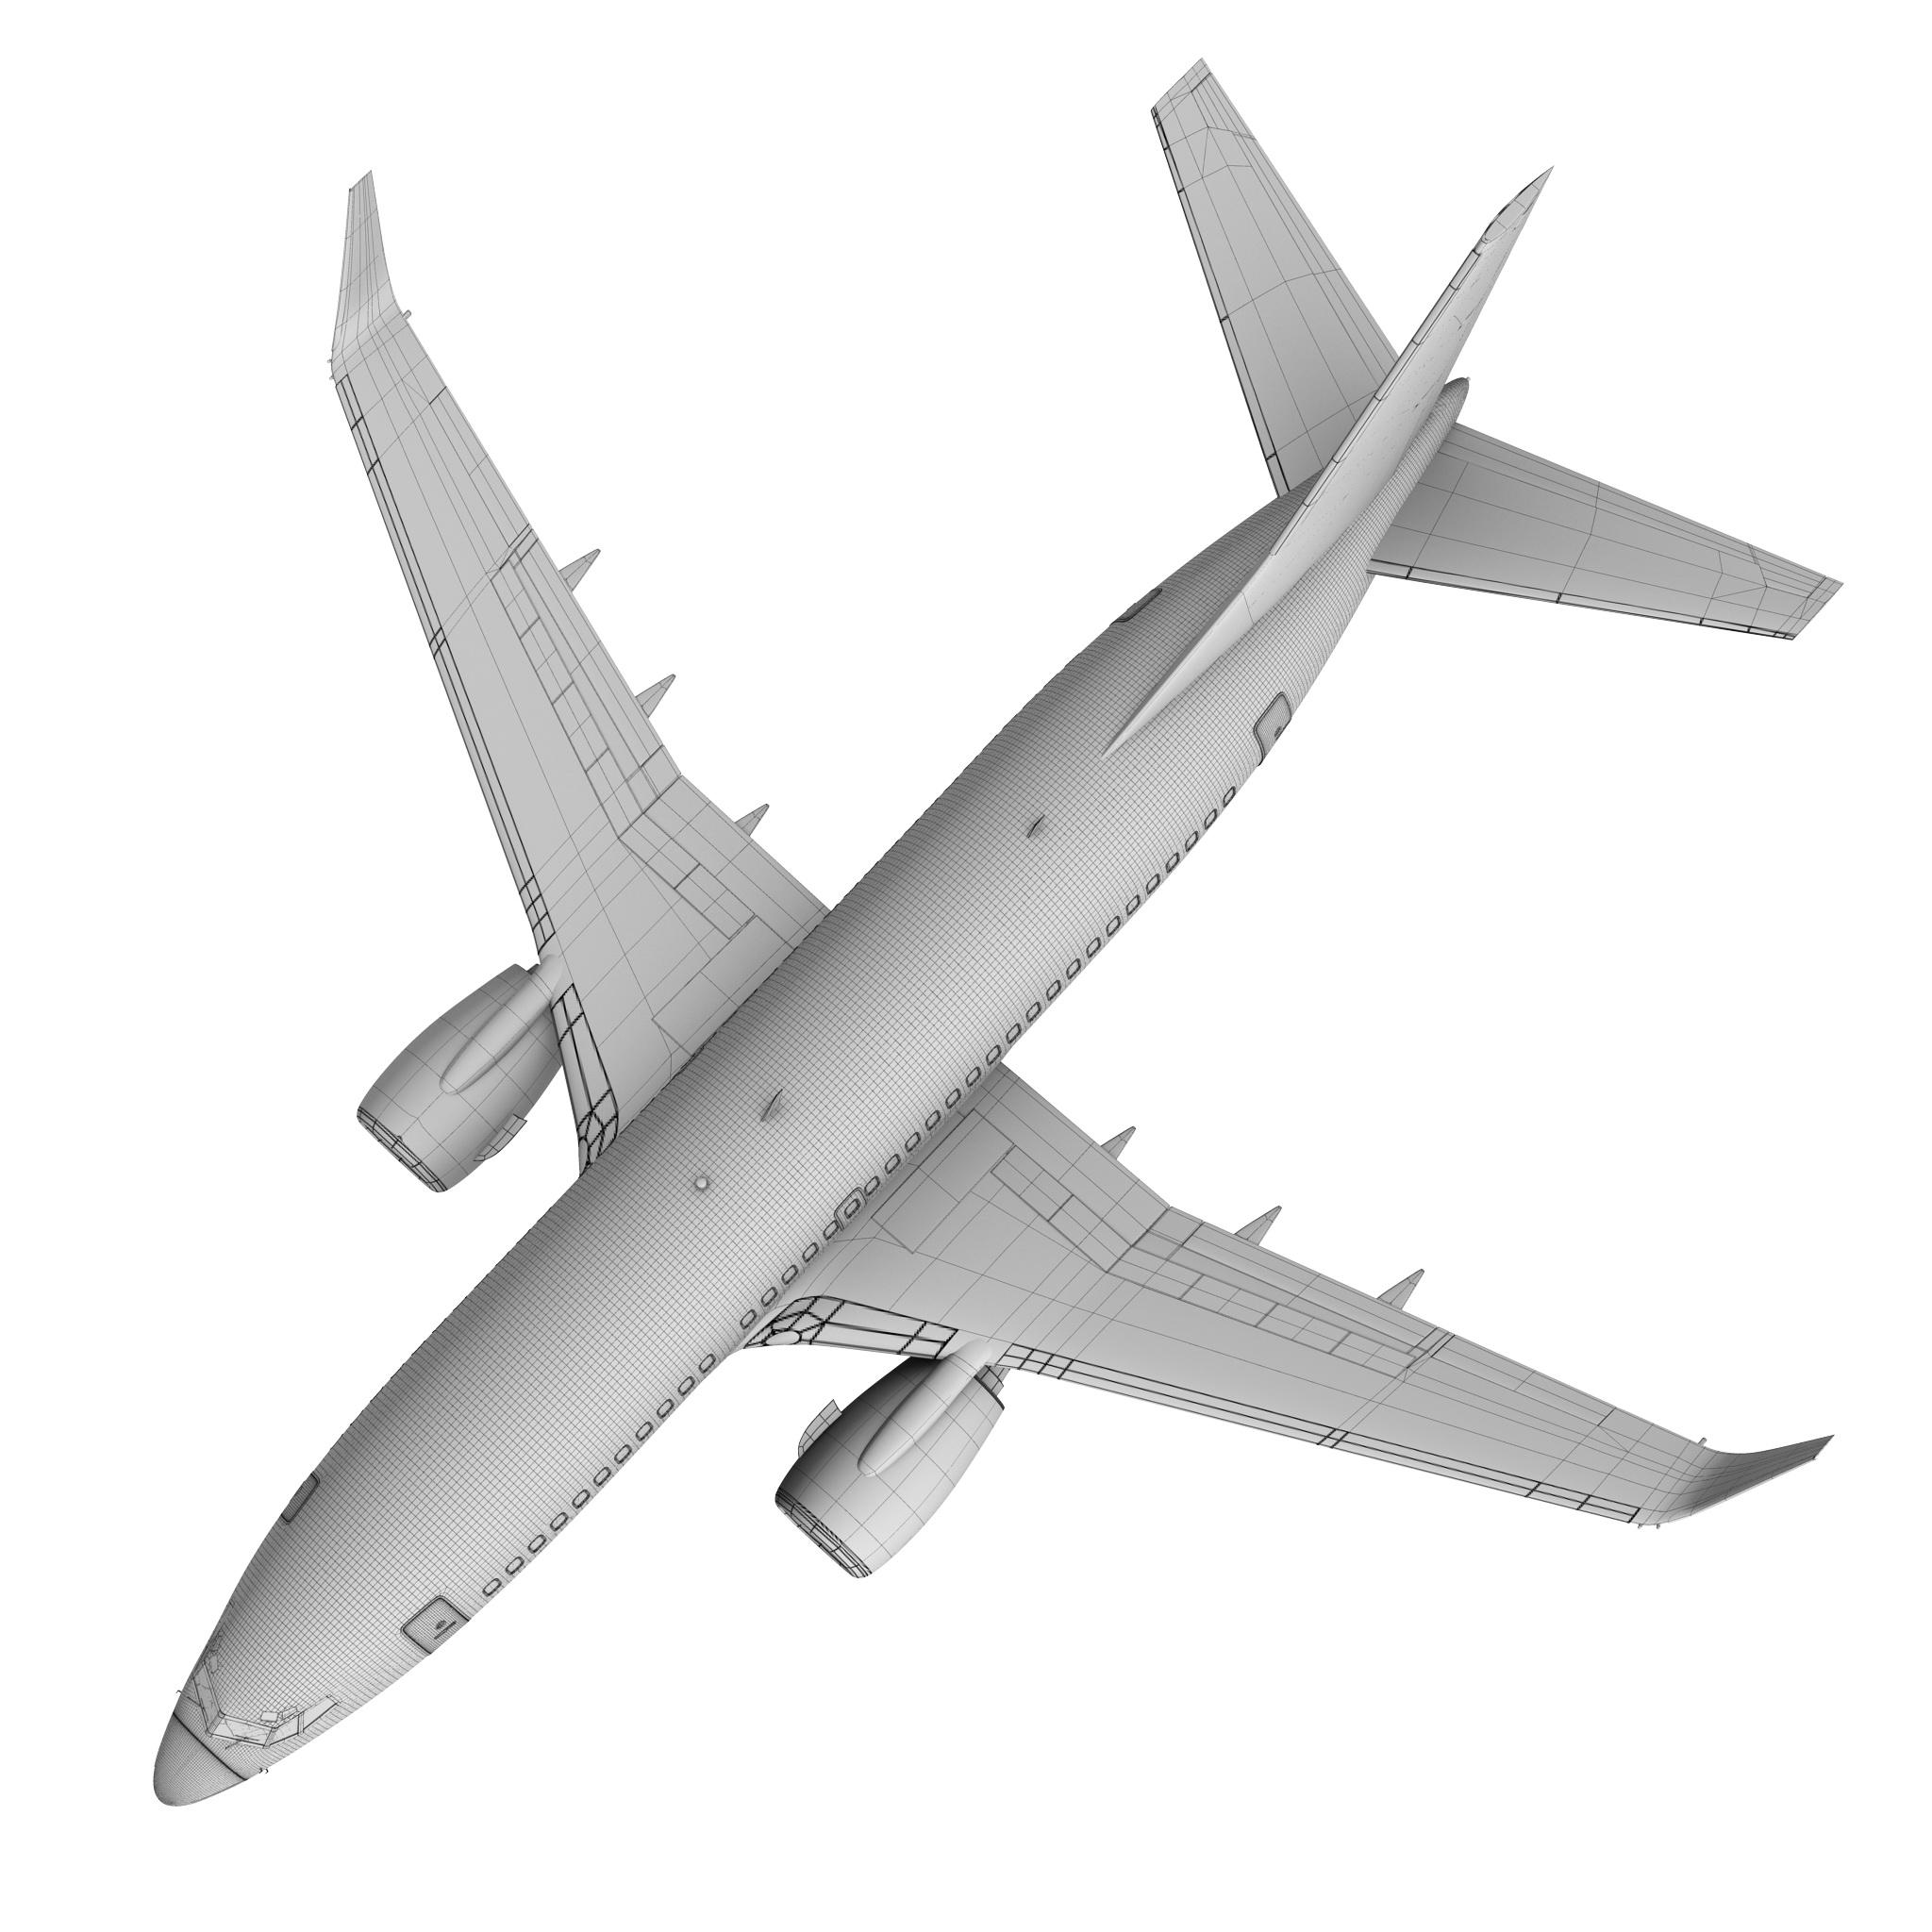 delta airlines boeing 737-700w 3d model max fbx c4d ma mb obj 120314